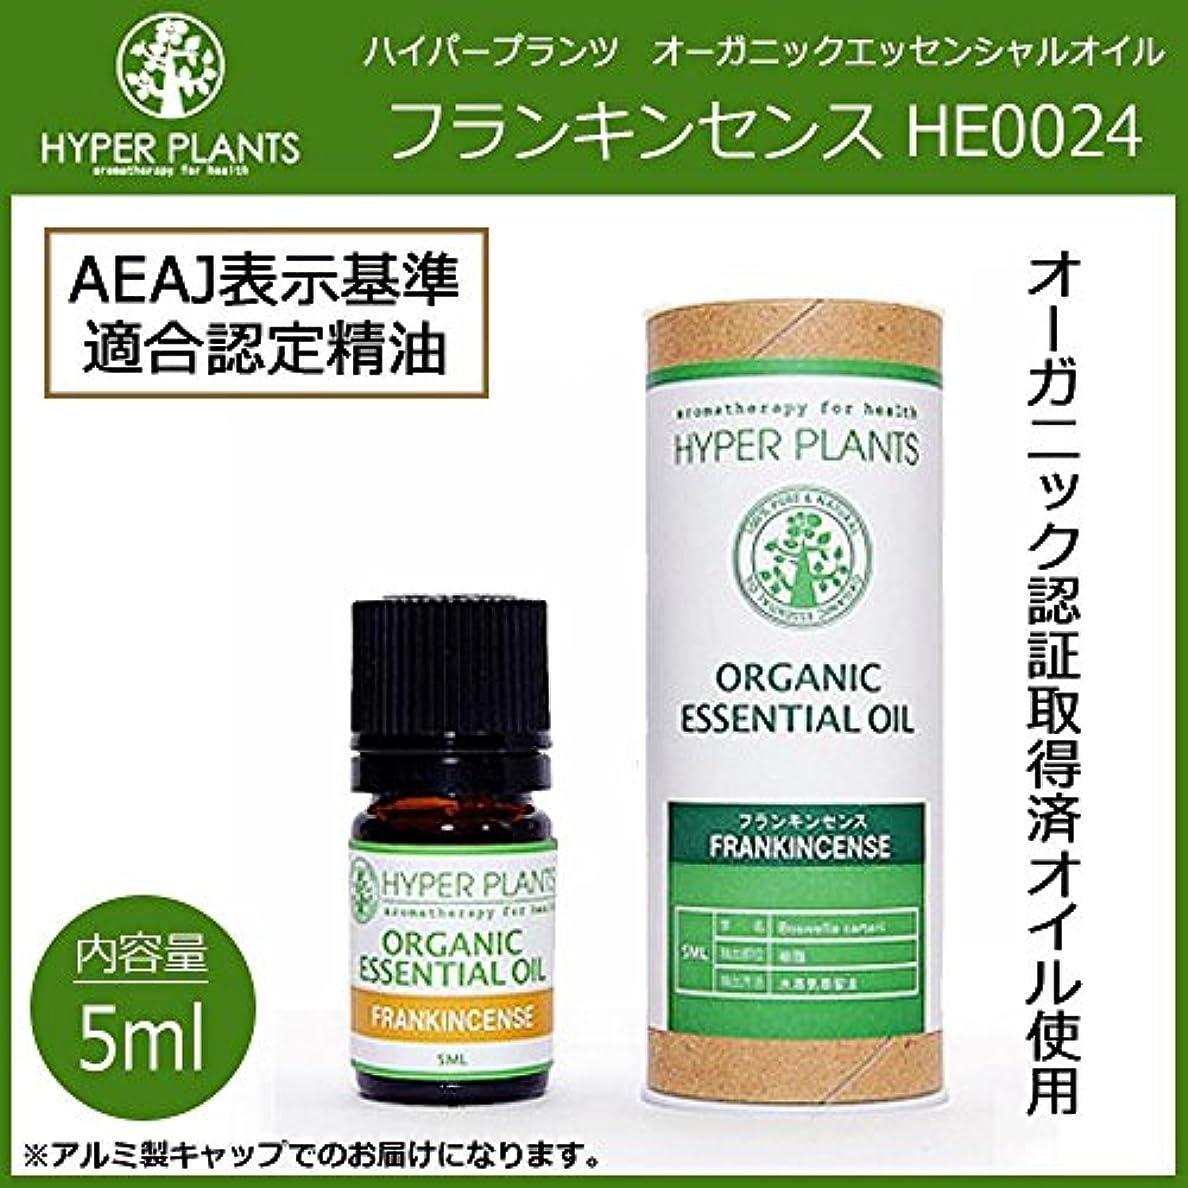 HYPER PLANTS ハイパープランツ オーガニックエッセンシャルオイル フランキンセンス 5ml HE0024